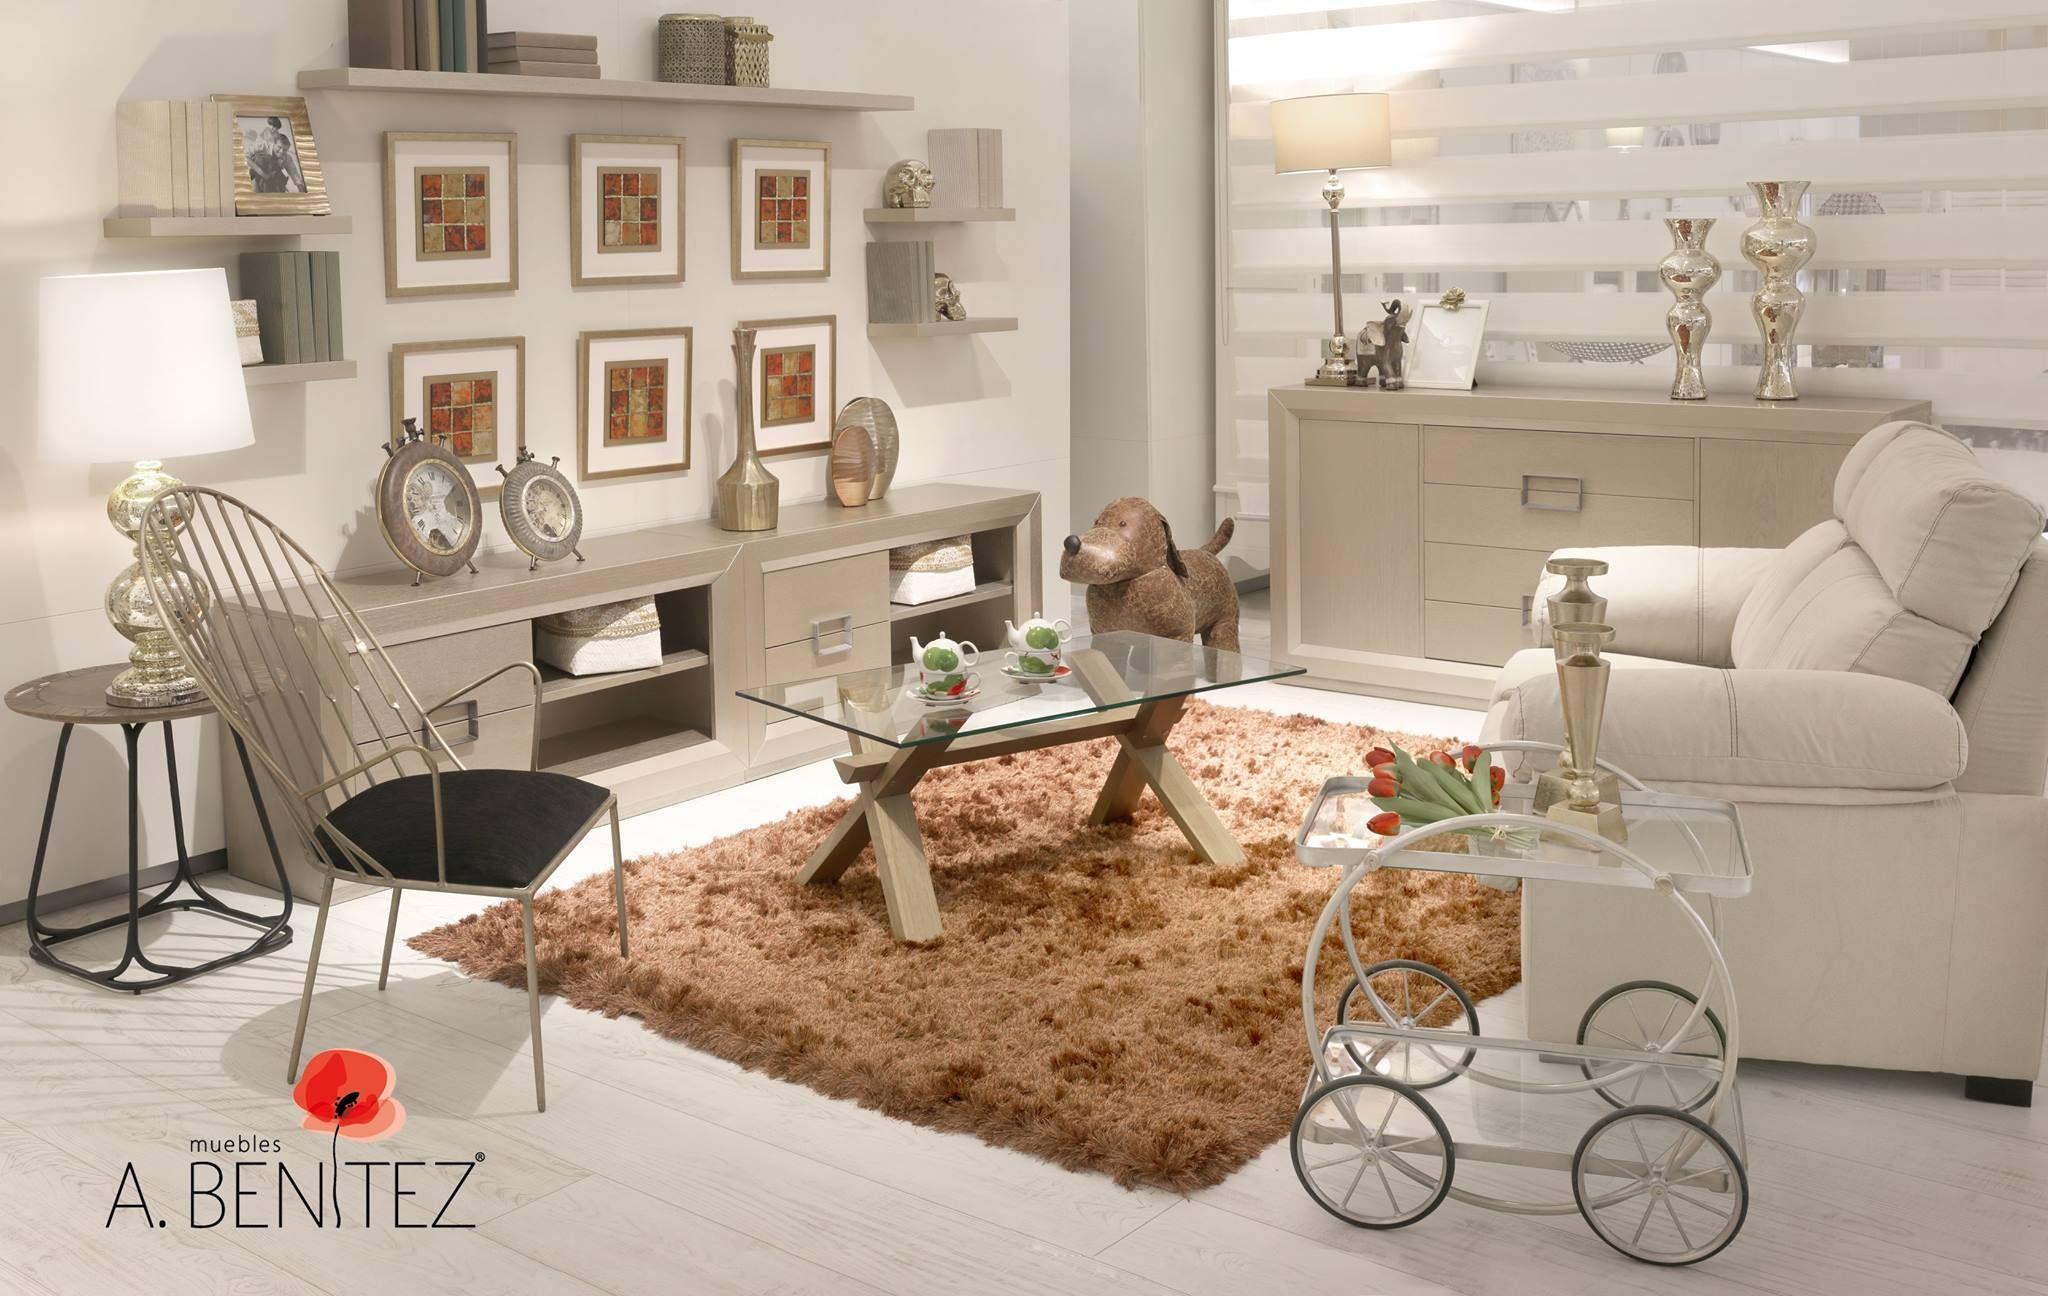 exposici n muebles benitez fuengirola muebles furniture